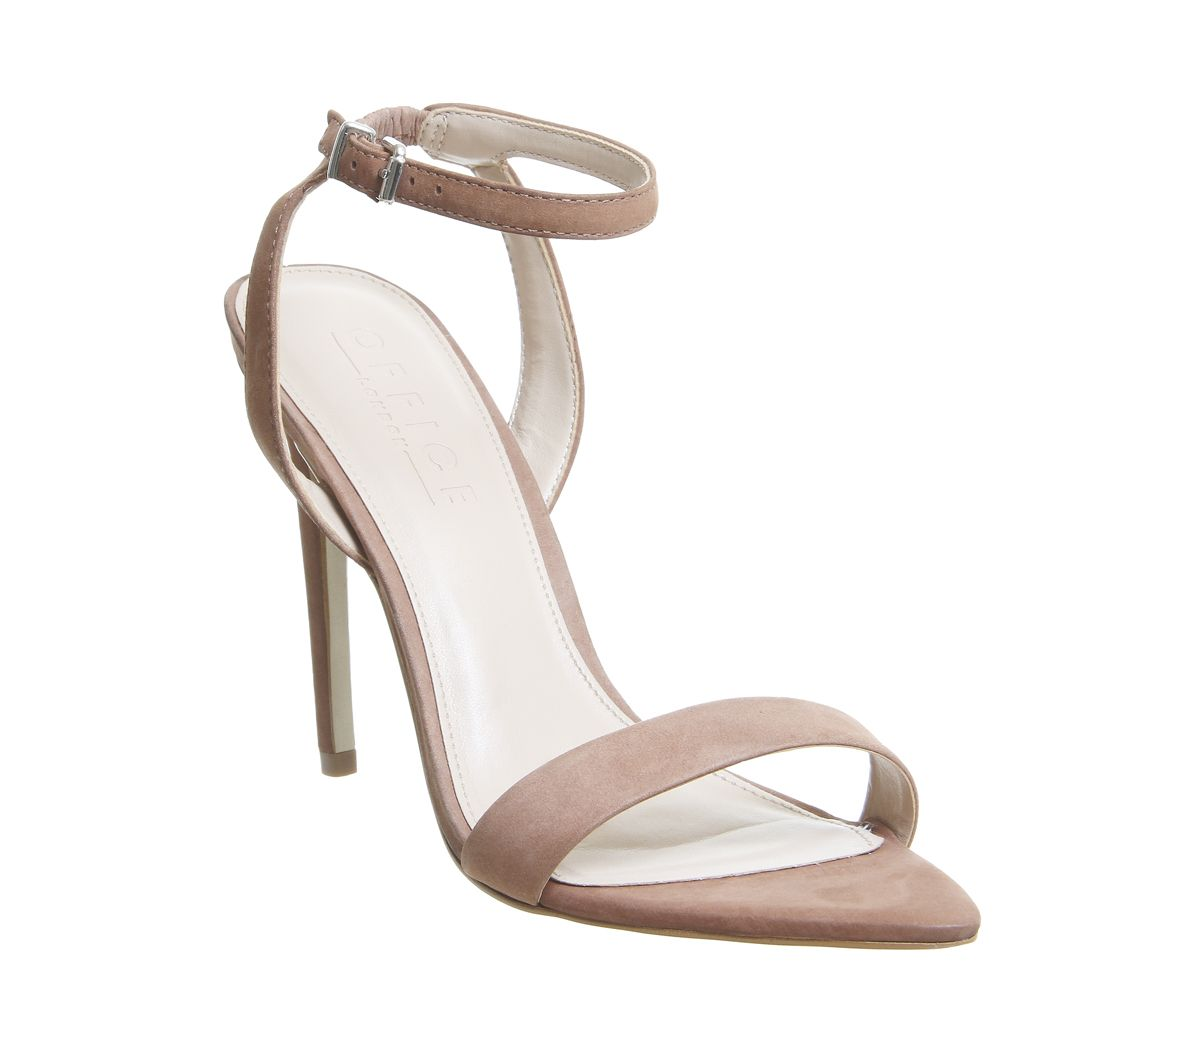 63d3d3d782e Hemlock Two Part Pointed Sandal Heels